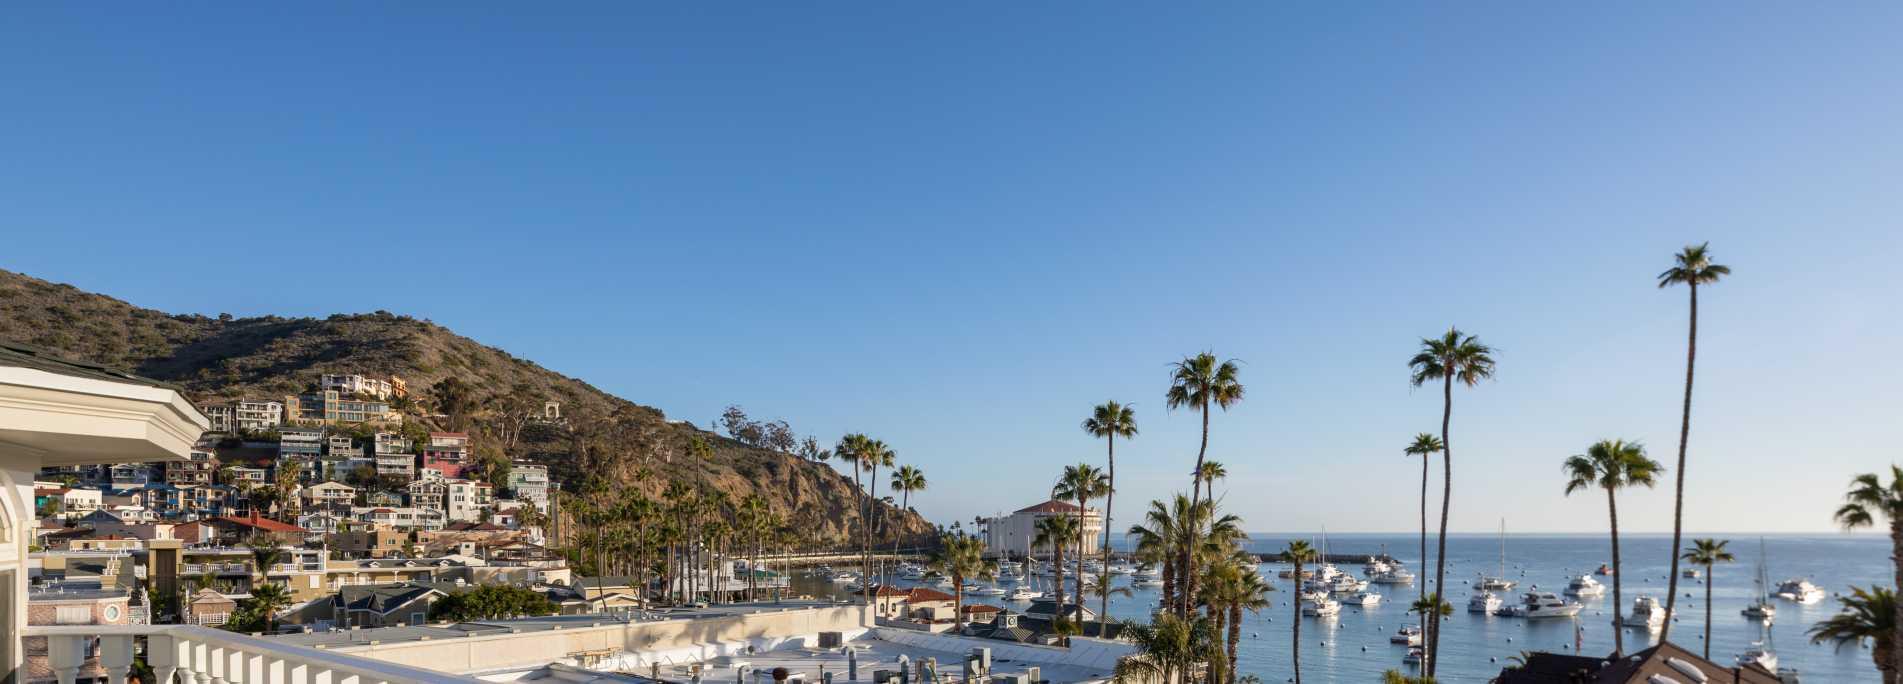 Catalina Island Hotels and Accommodations | Catalina Island on